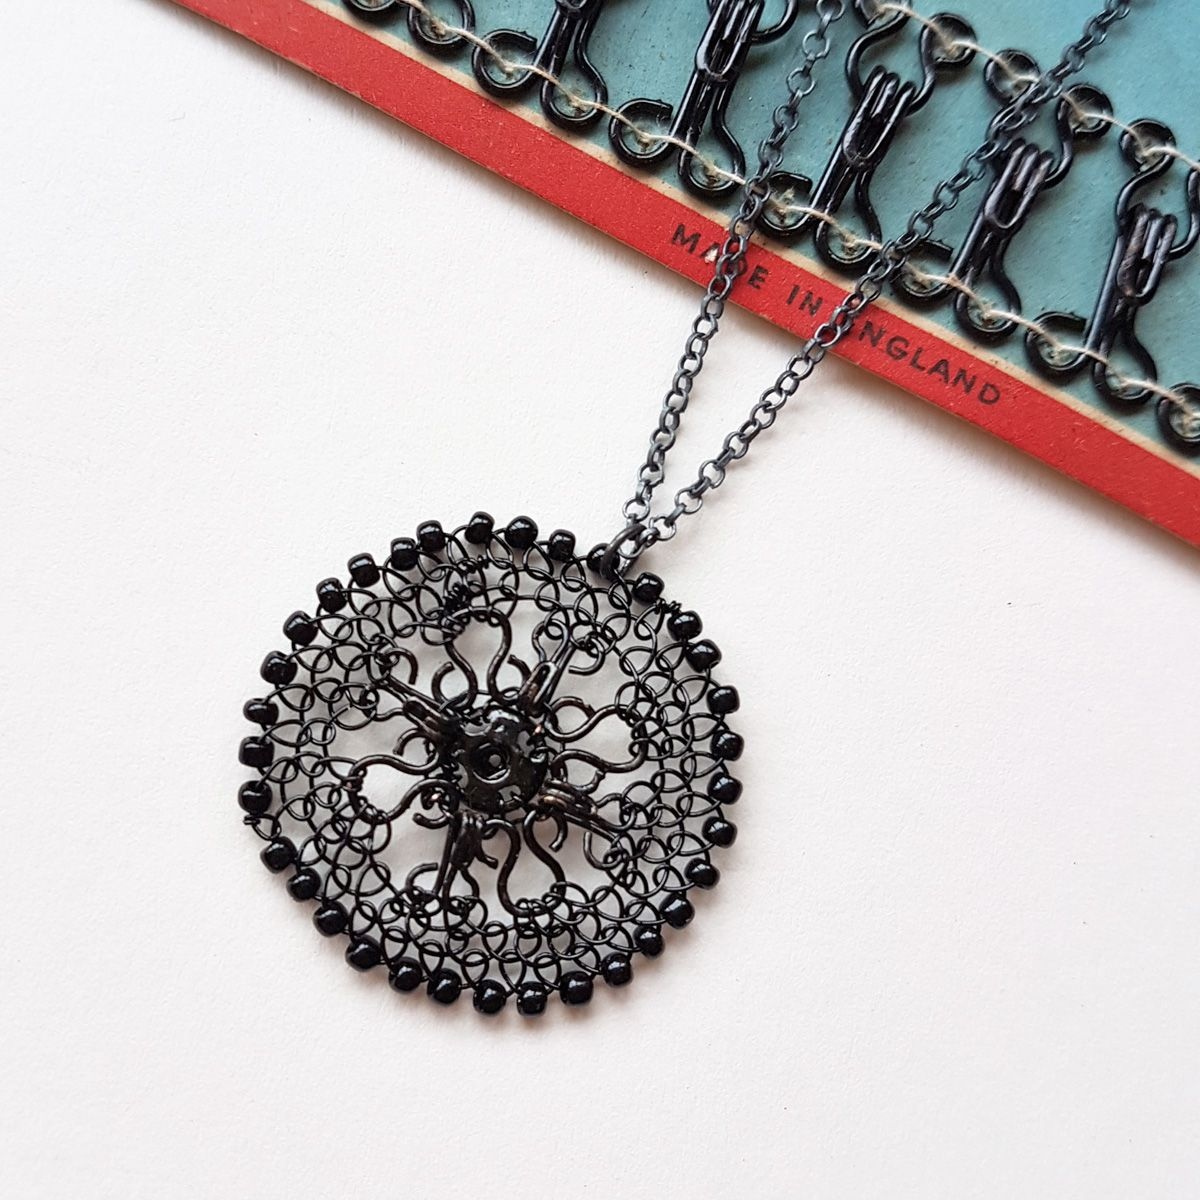 Haberdsahery Jewellery by Judith Brown